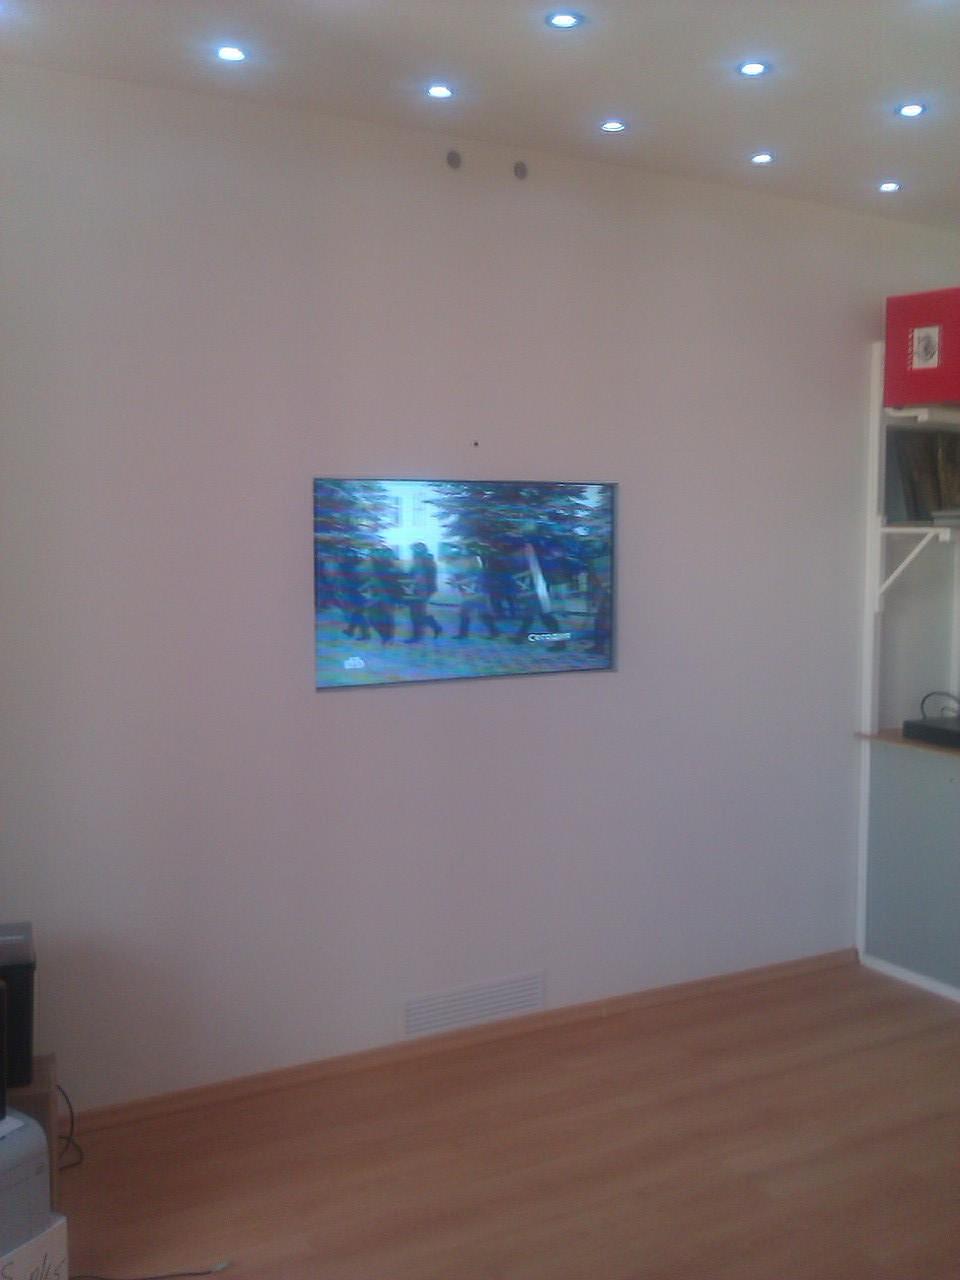 Hide an LCD TV behind drywall